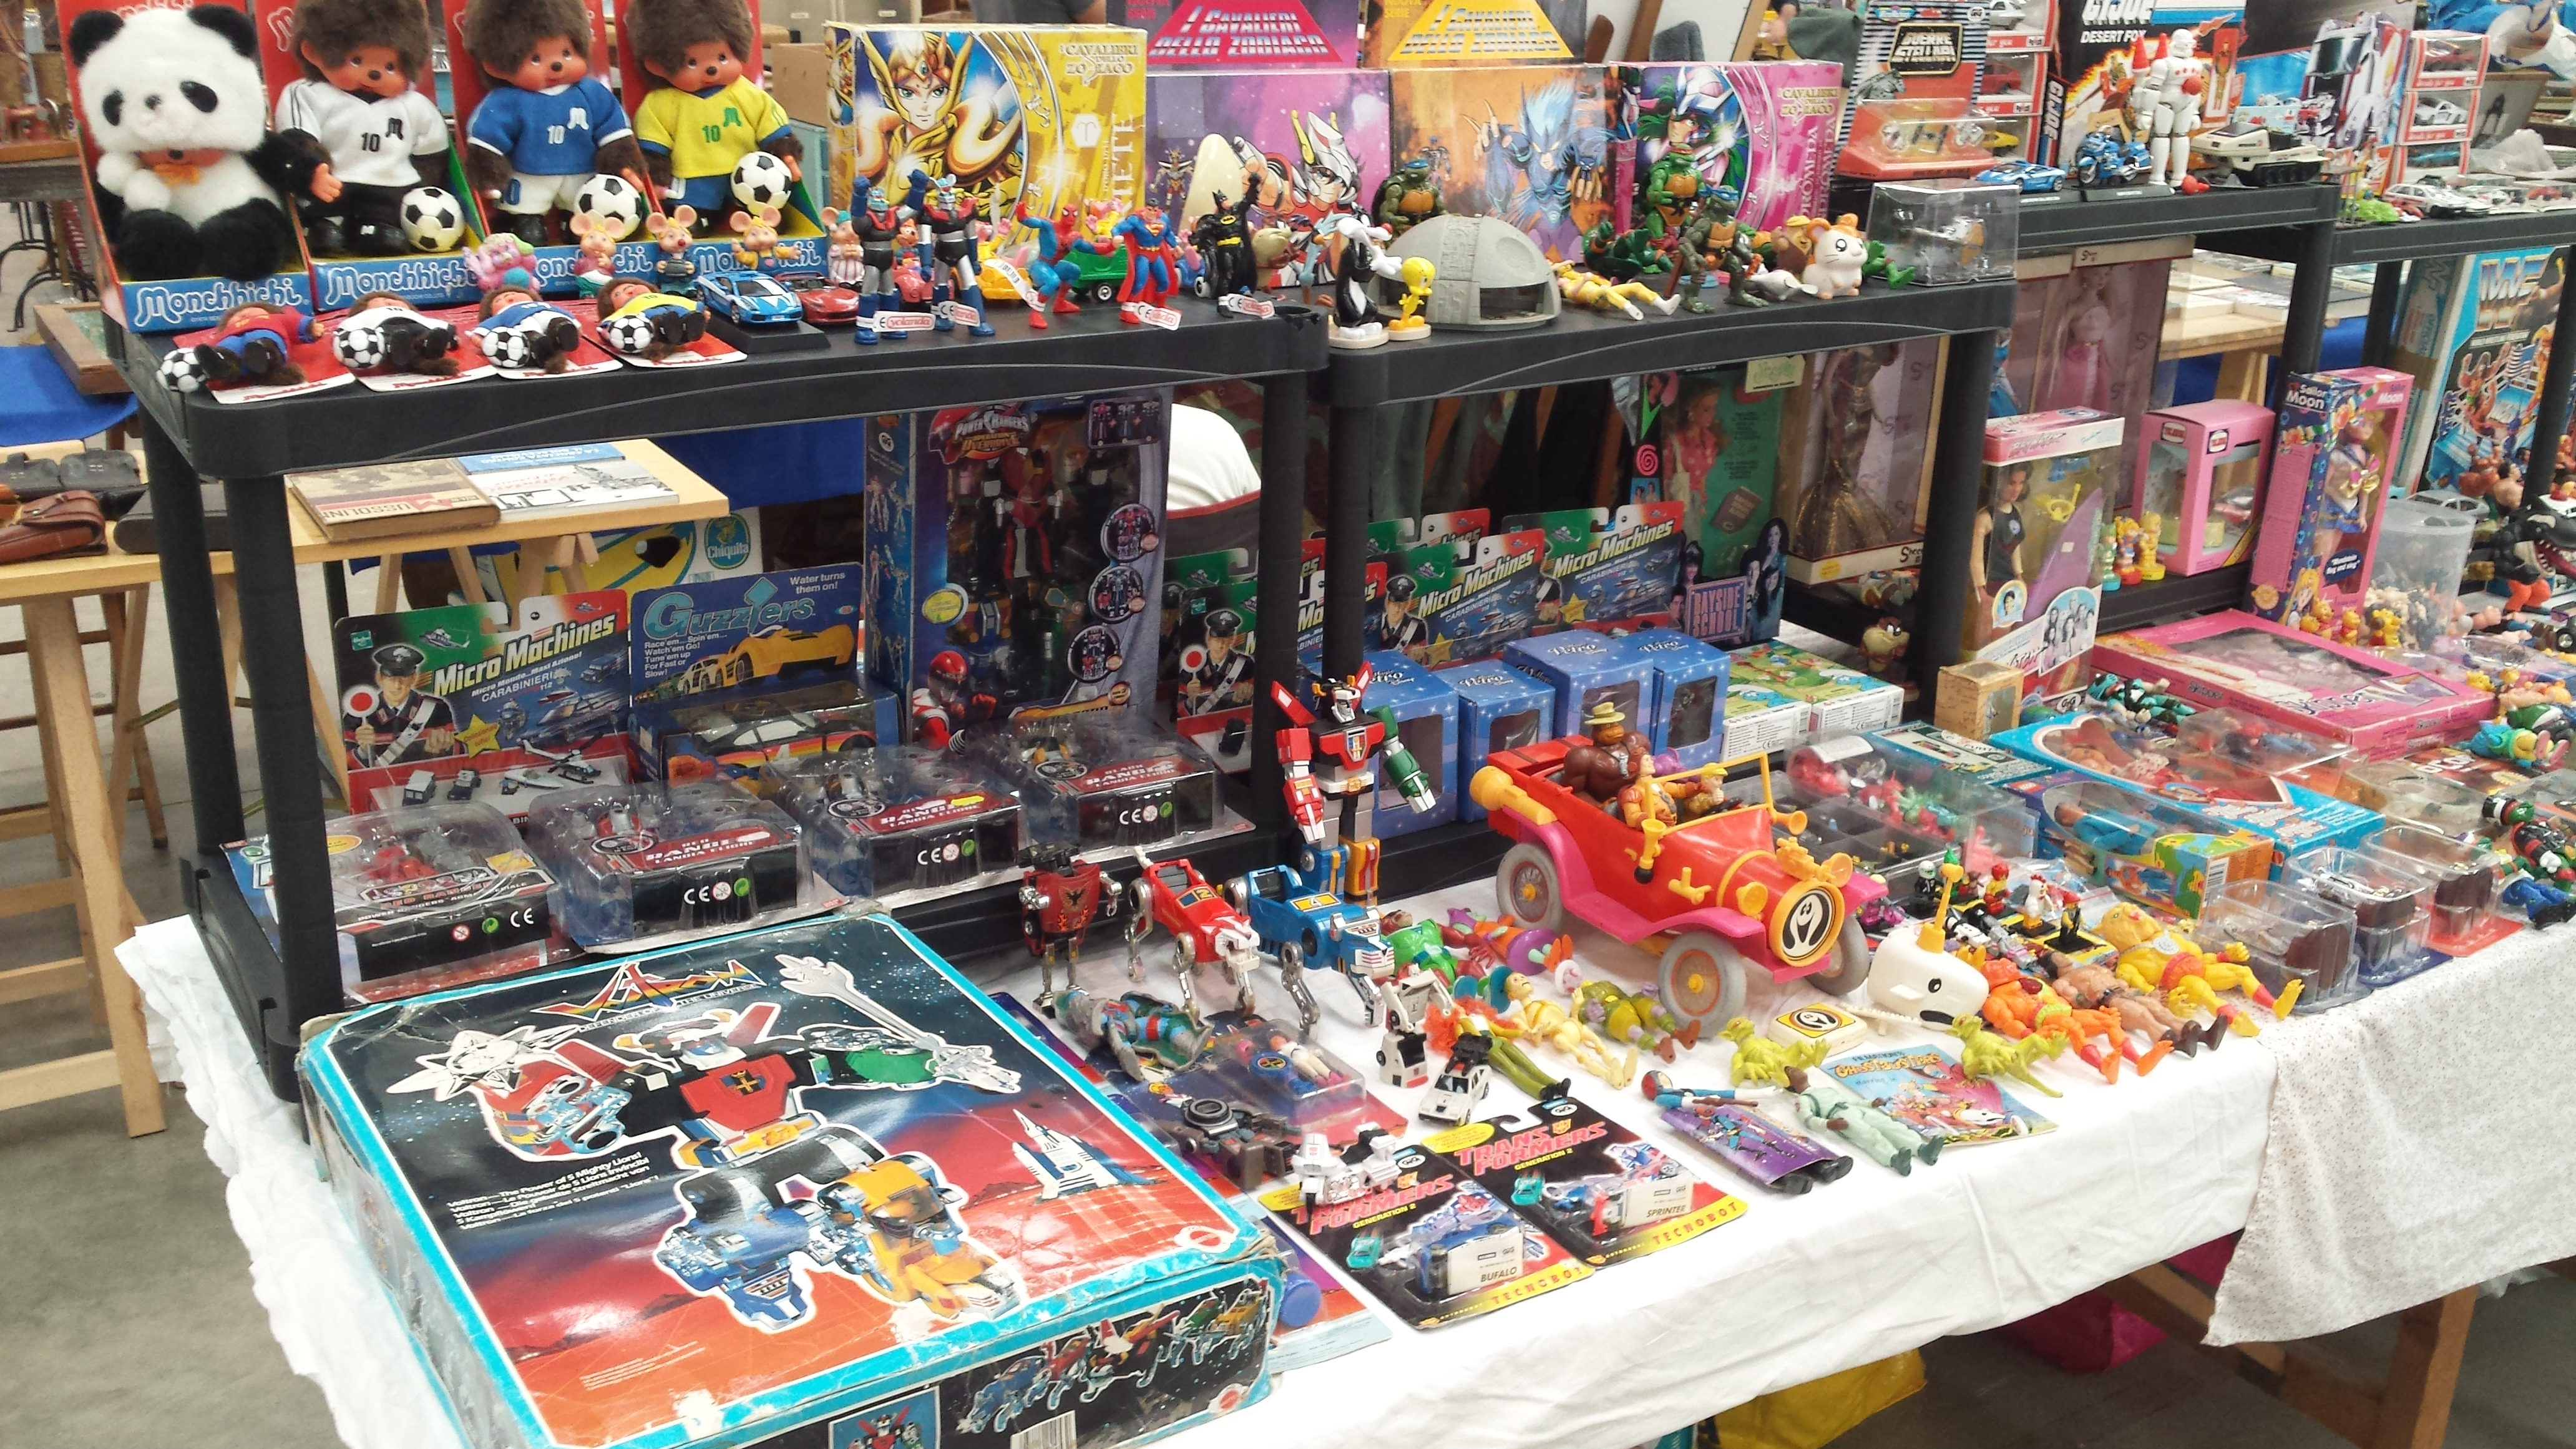 Gonzaga il massimo dei giocattoli for Gonzaga mercatino